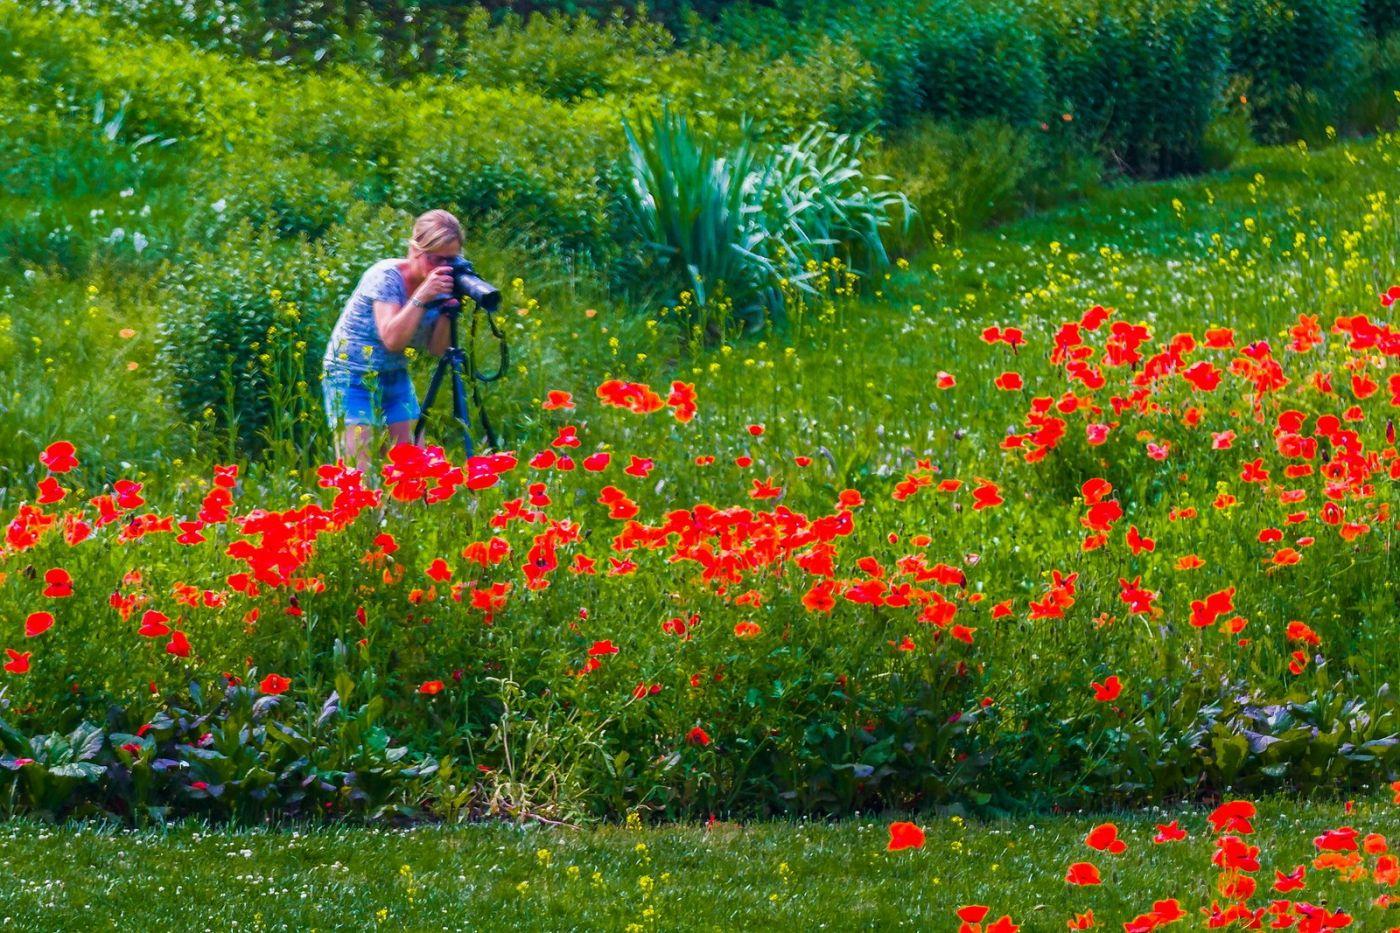 Chanticleer花园,享受大自然_图1-5